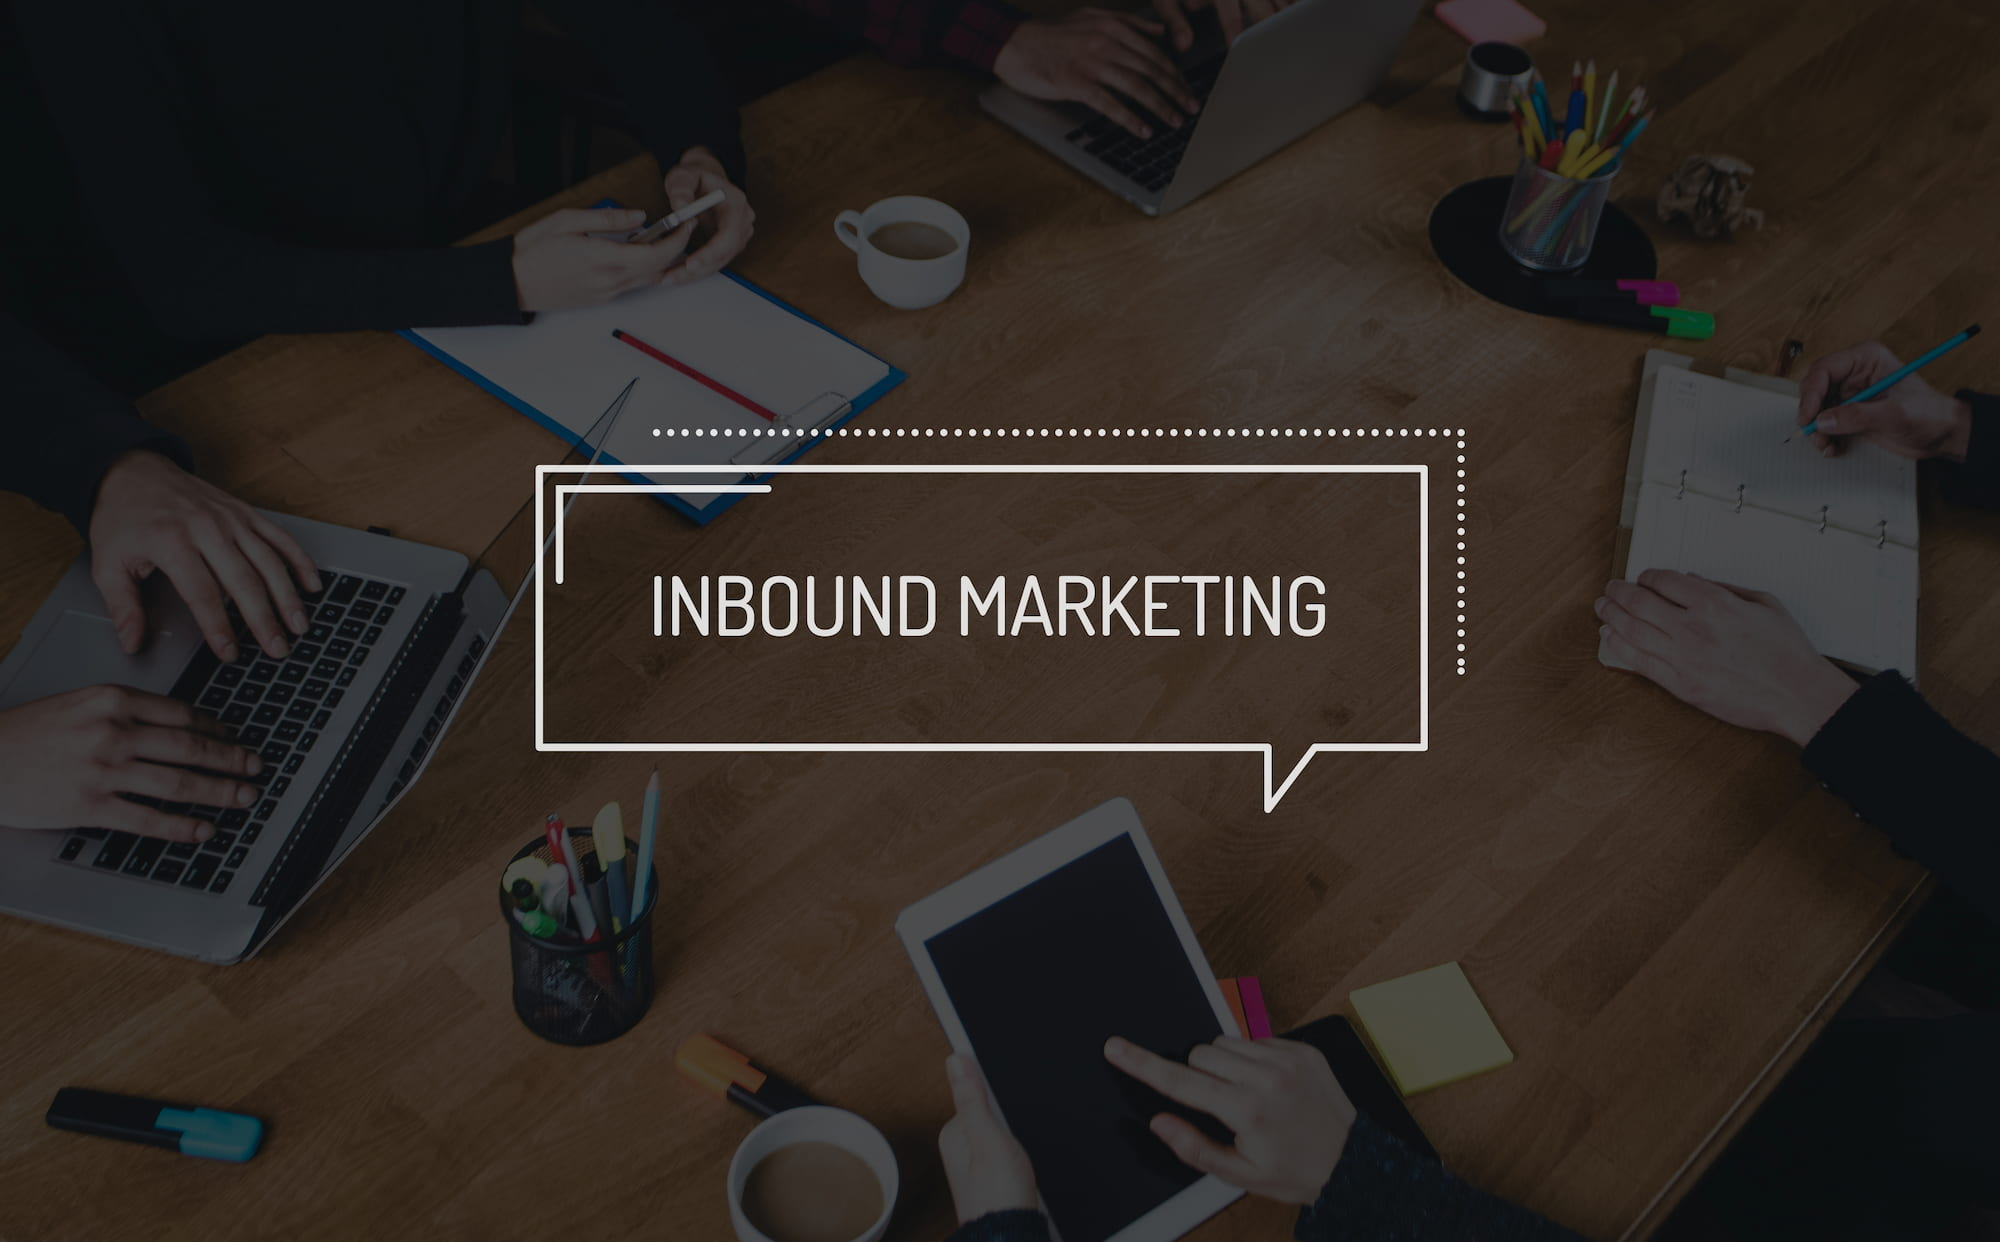 Inbound Marketing สร้างเสน่ห์ให้แบรนด์ของคุณ